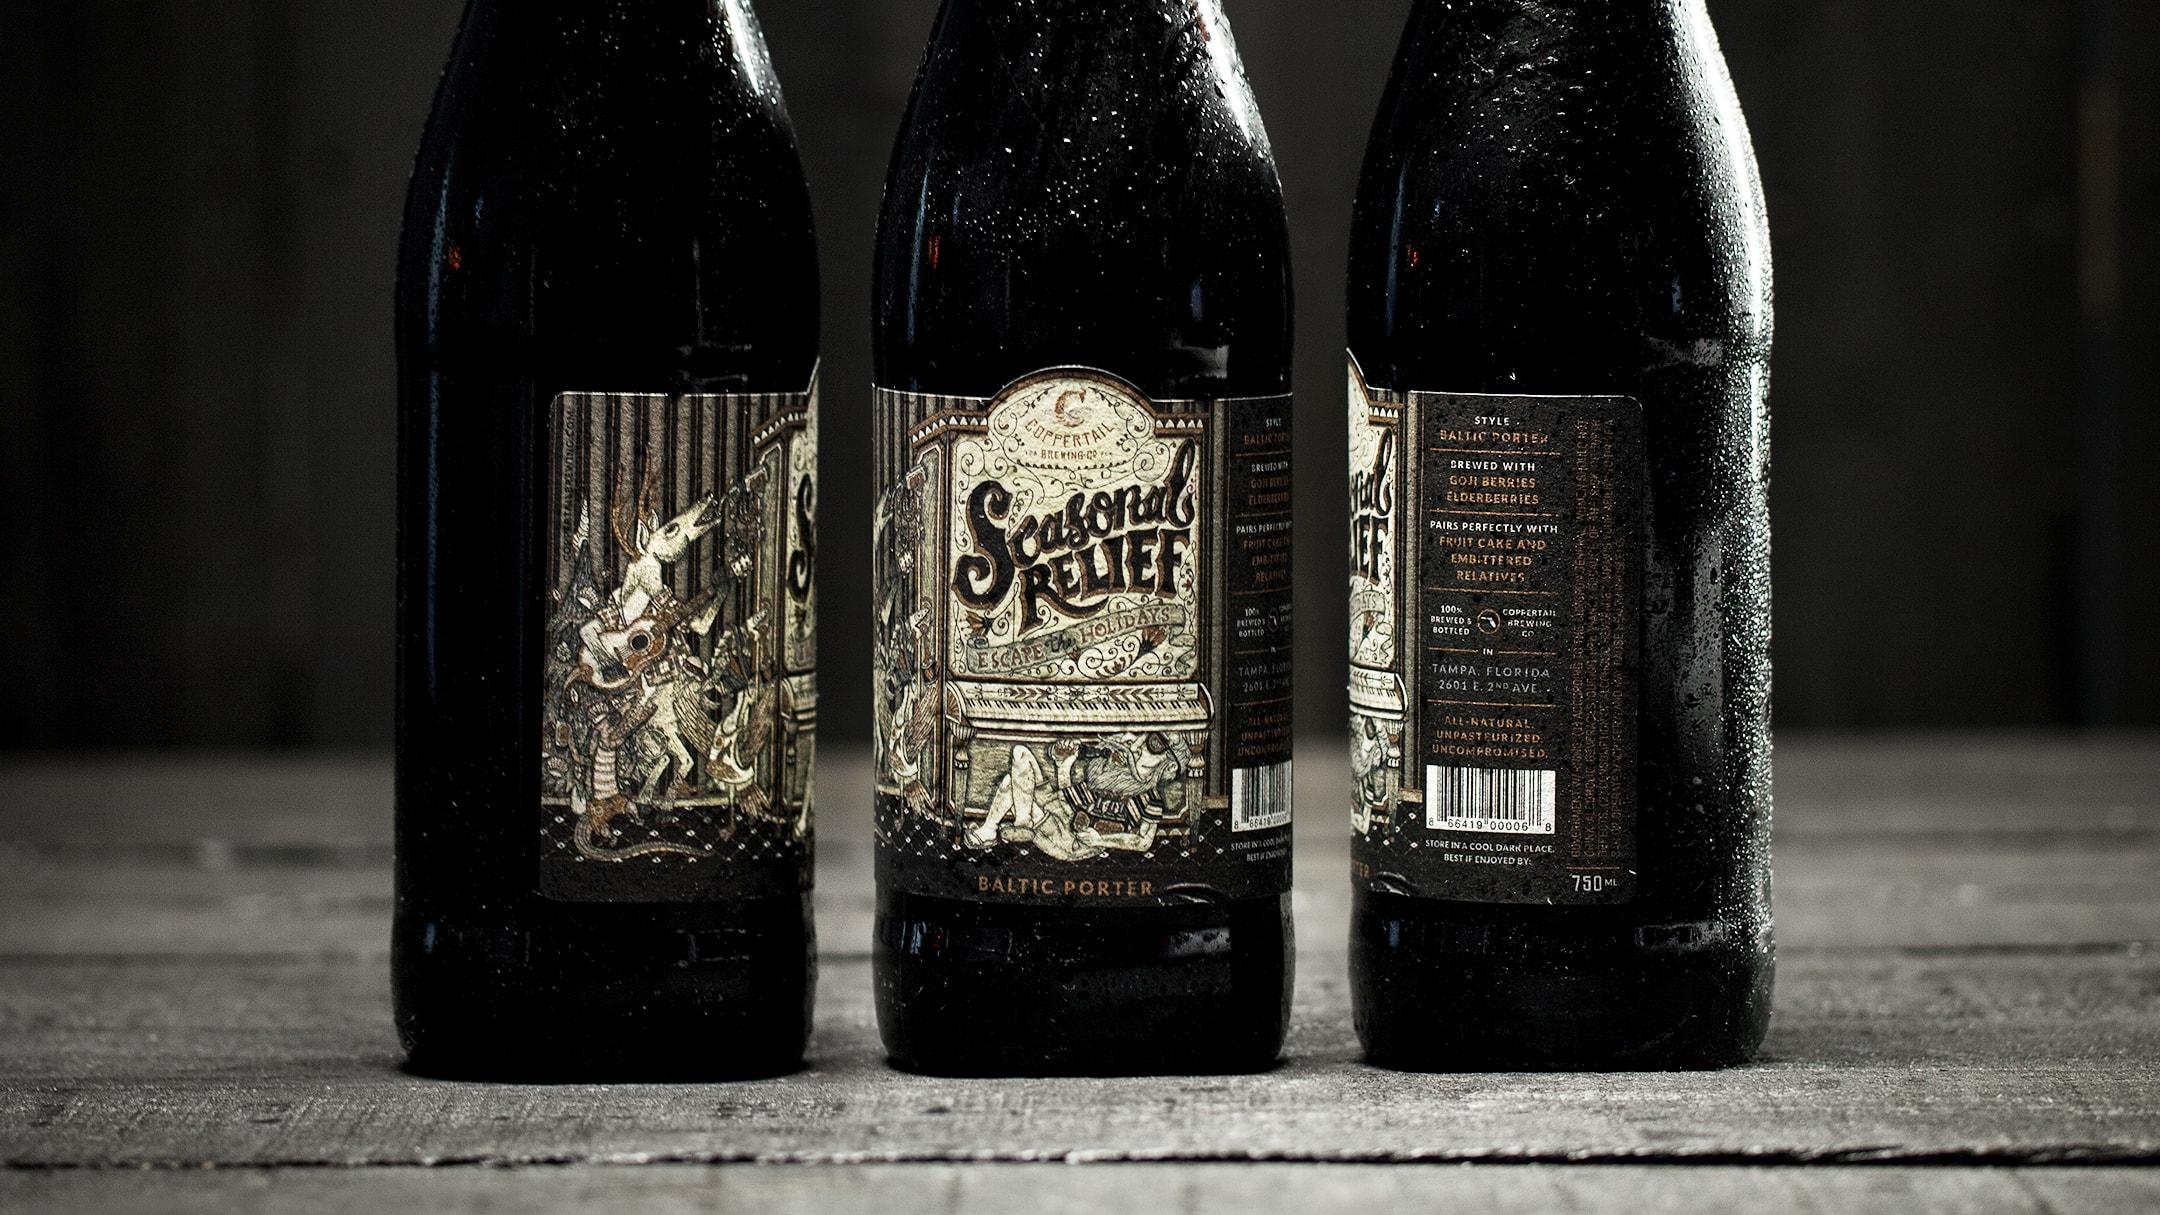 Coppertail specialty seasonal label on bottles